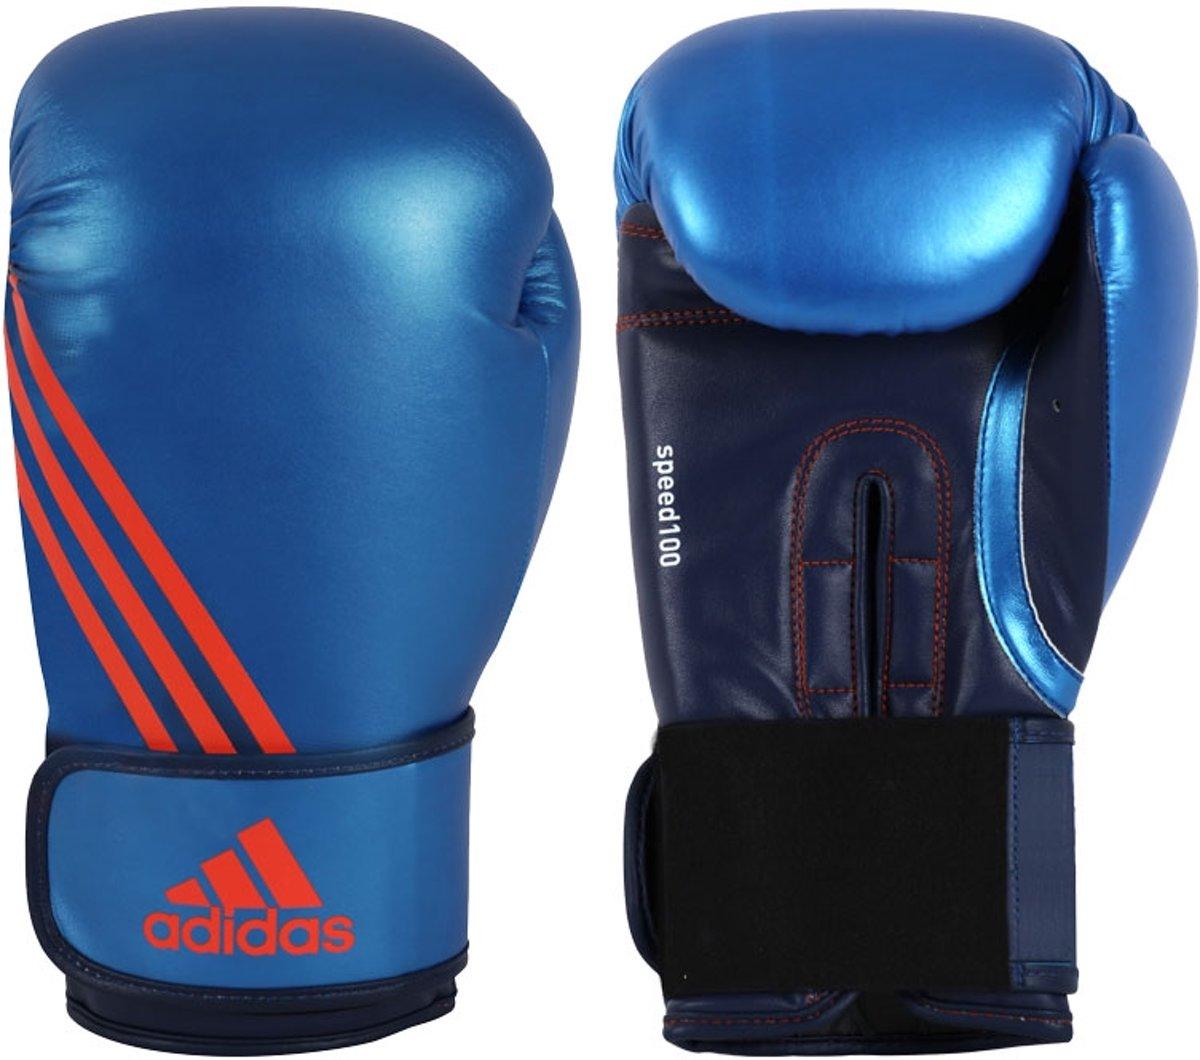 Adidas Speed 100 (Kick)Bokshandschoenen Blauw - 6 oz